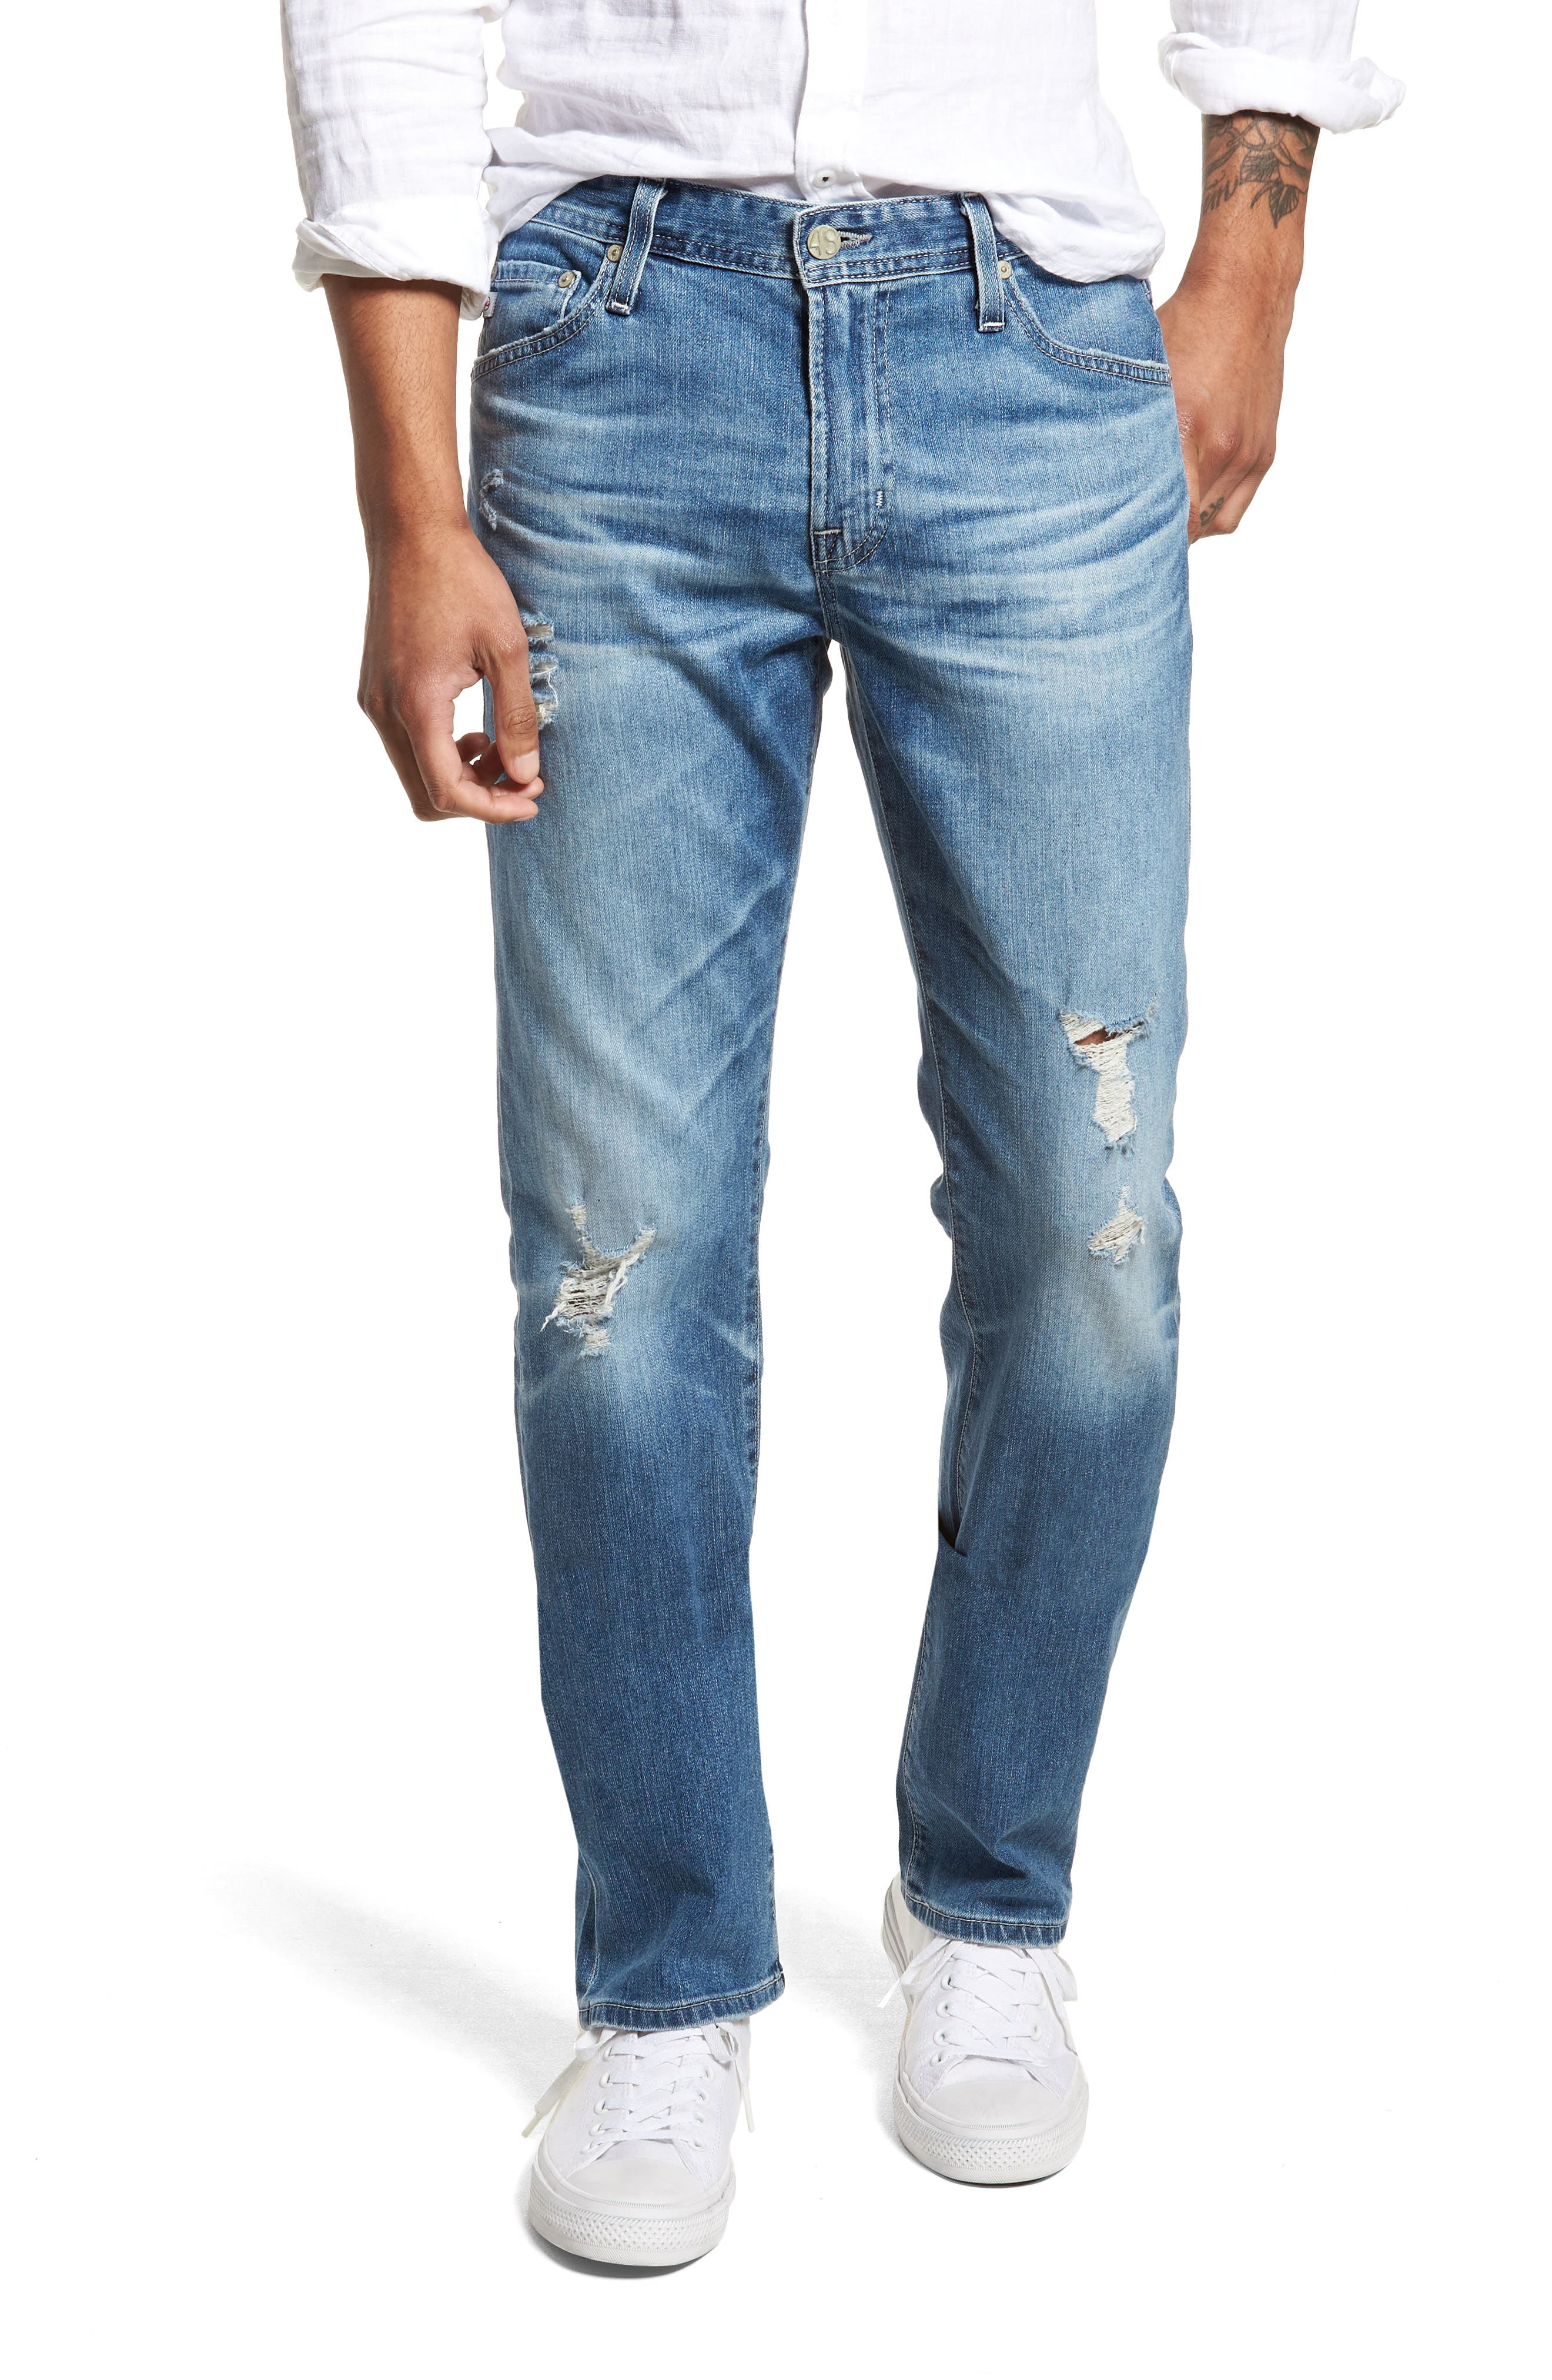 Everett Slim Straight Leg Jeans,                         Main,                         color, 15 YEARS SWEPT UP